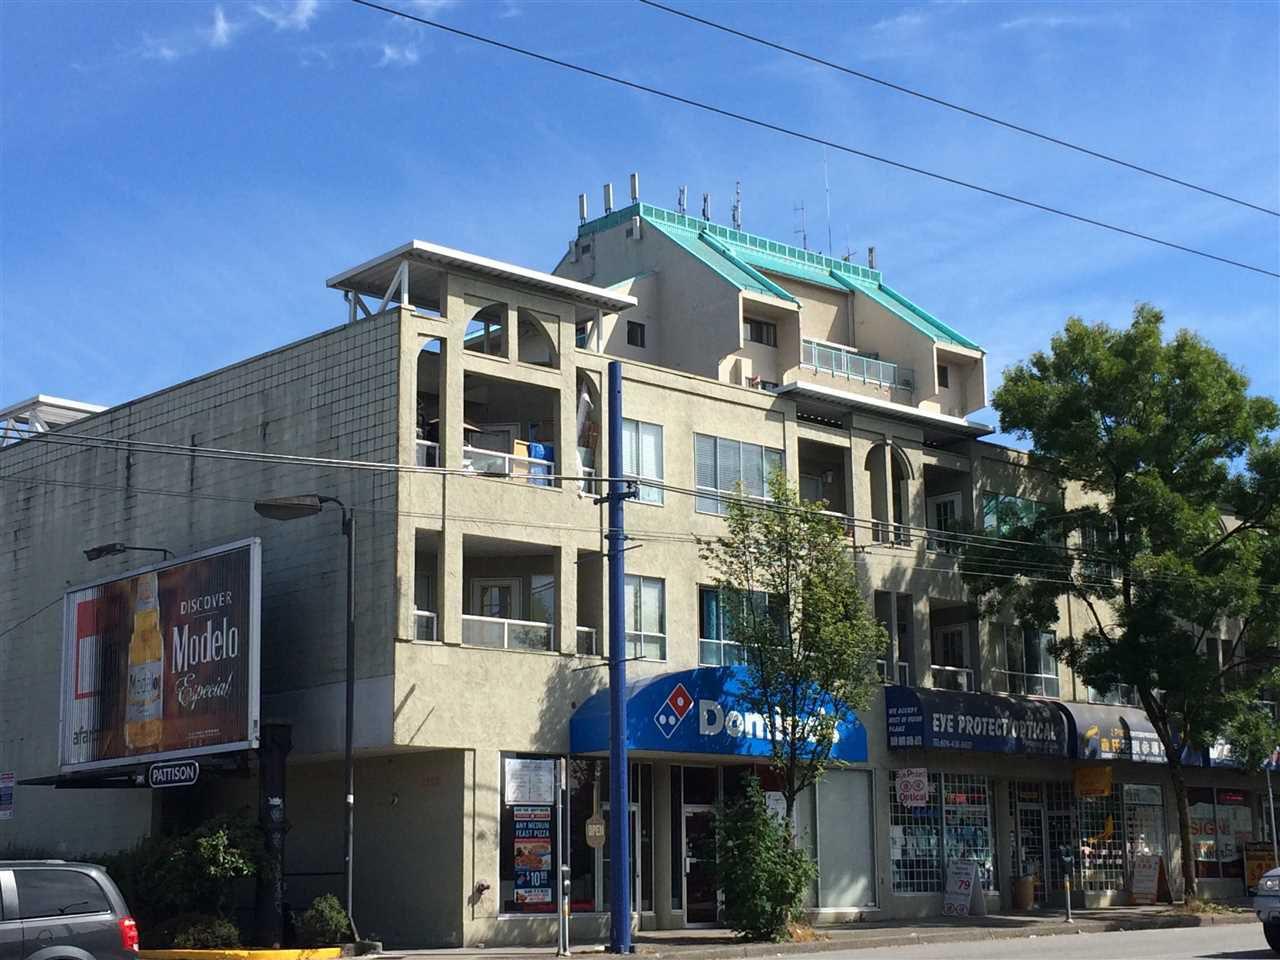 "Main Photo: 305 5520 JOYCE Street in Vancouver: Killarney VE Condo for sale in ""CAMFRAY GARDENS"" (Vancouver East)  : MLS®# R2023211"